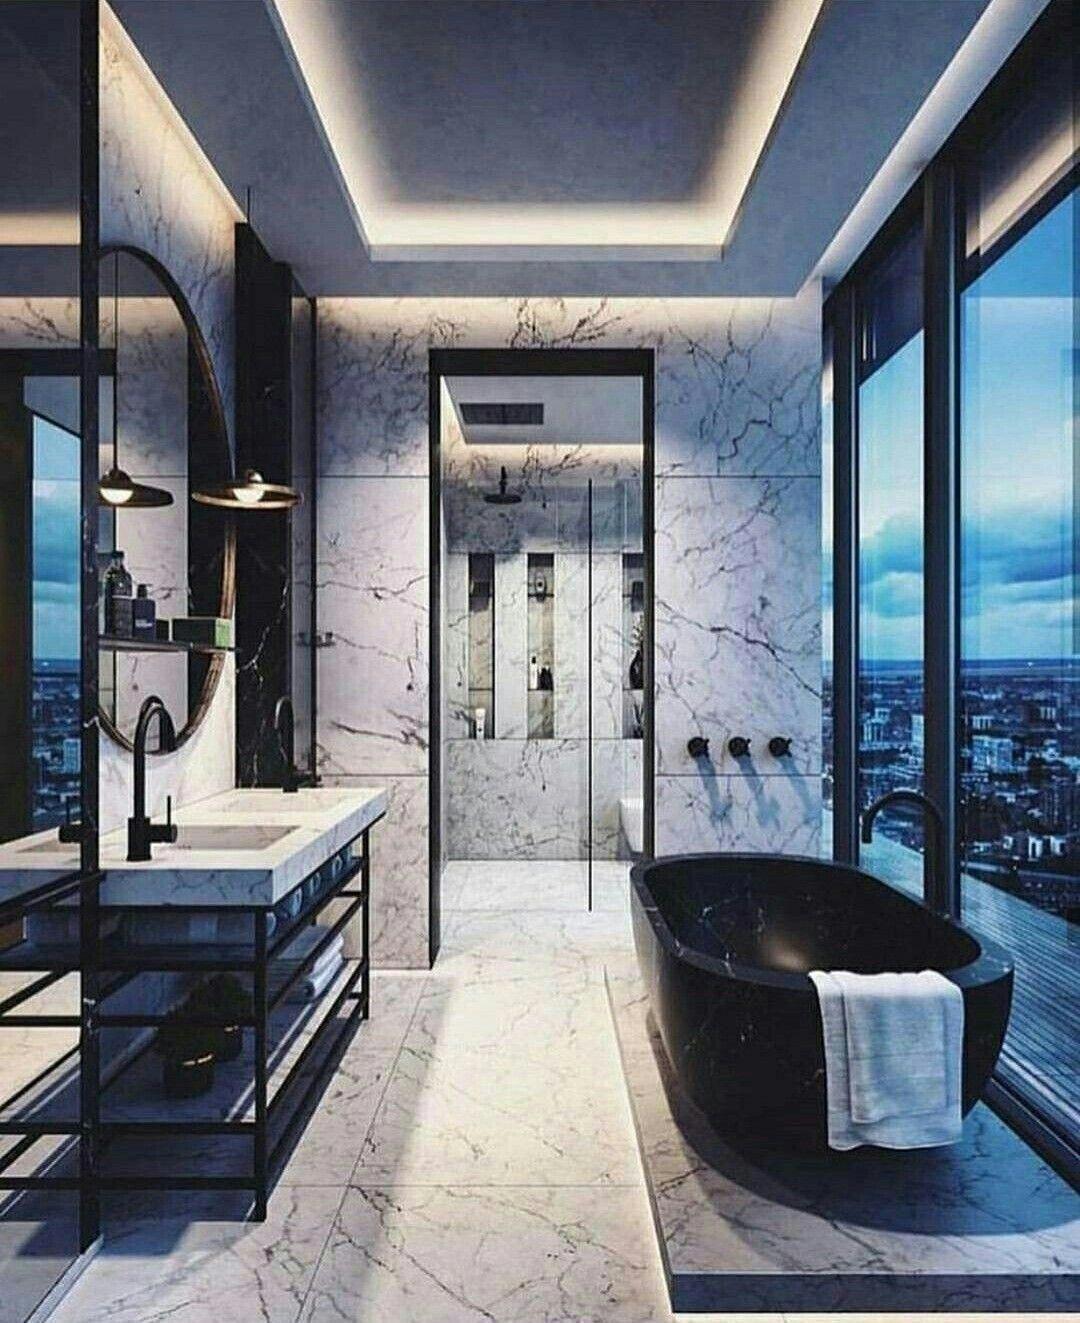 Bathroom Remodel Ideas Tuscan Bathroom Design Luxury Small Bathroom Remodel Designs Bathroom Remodel Designs